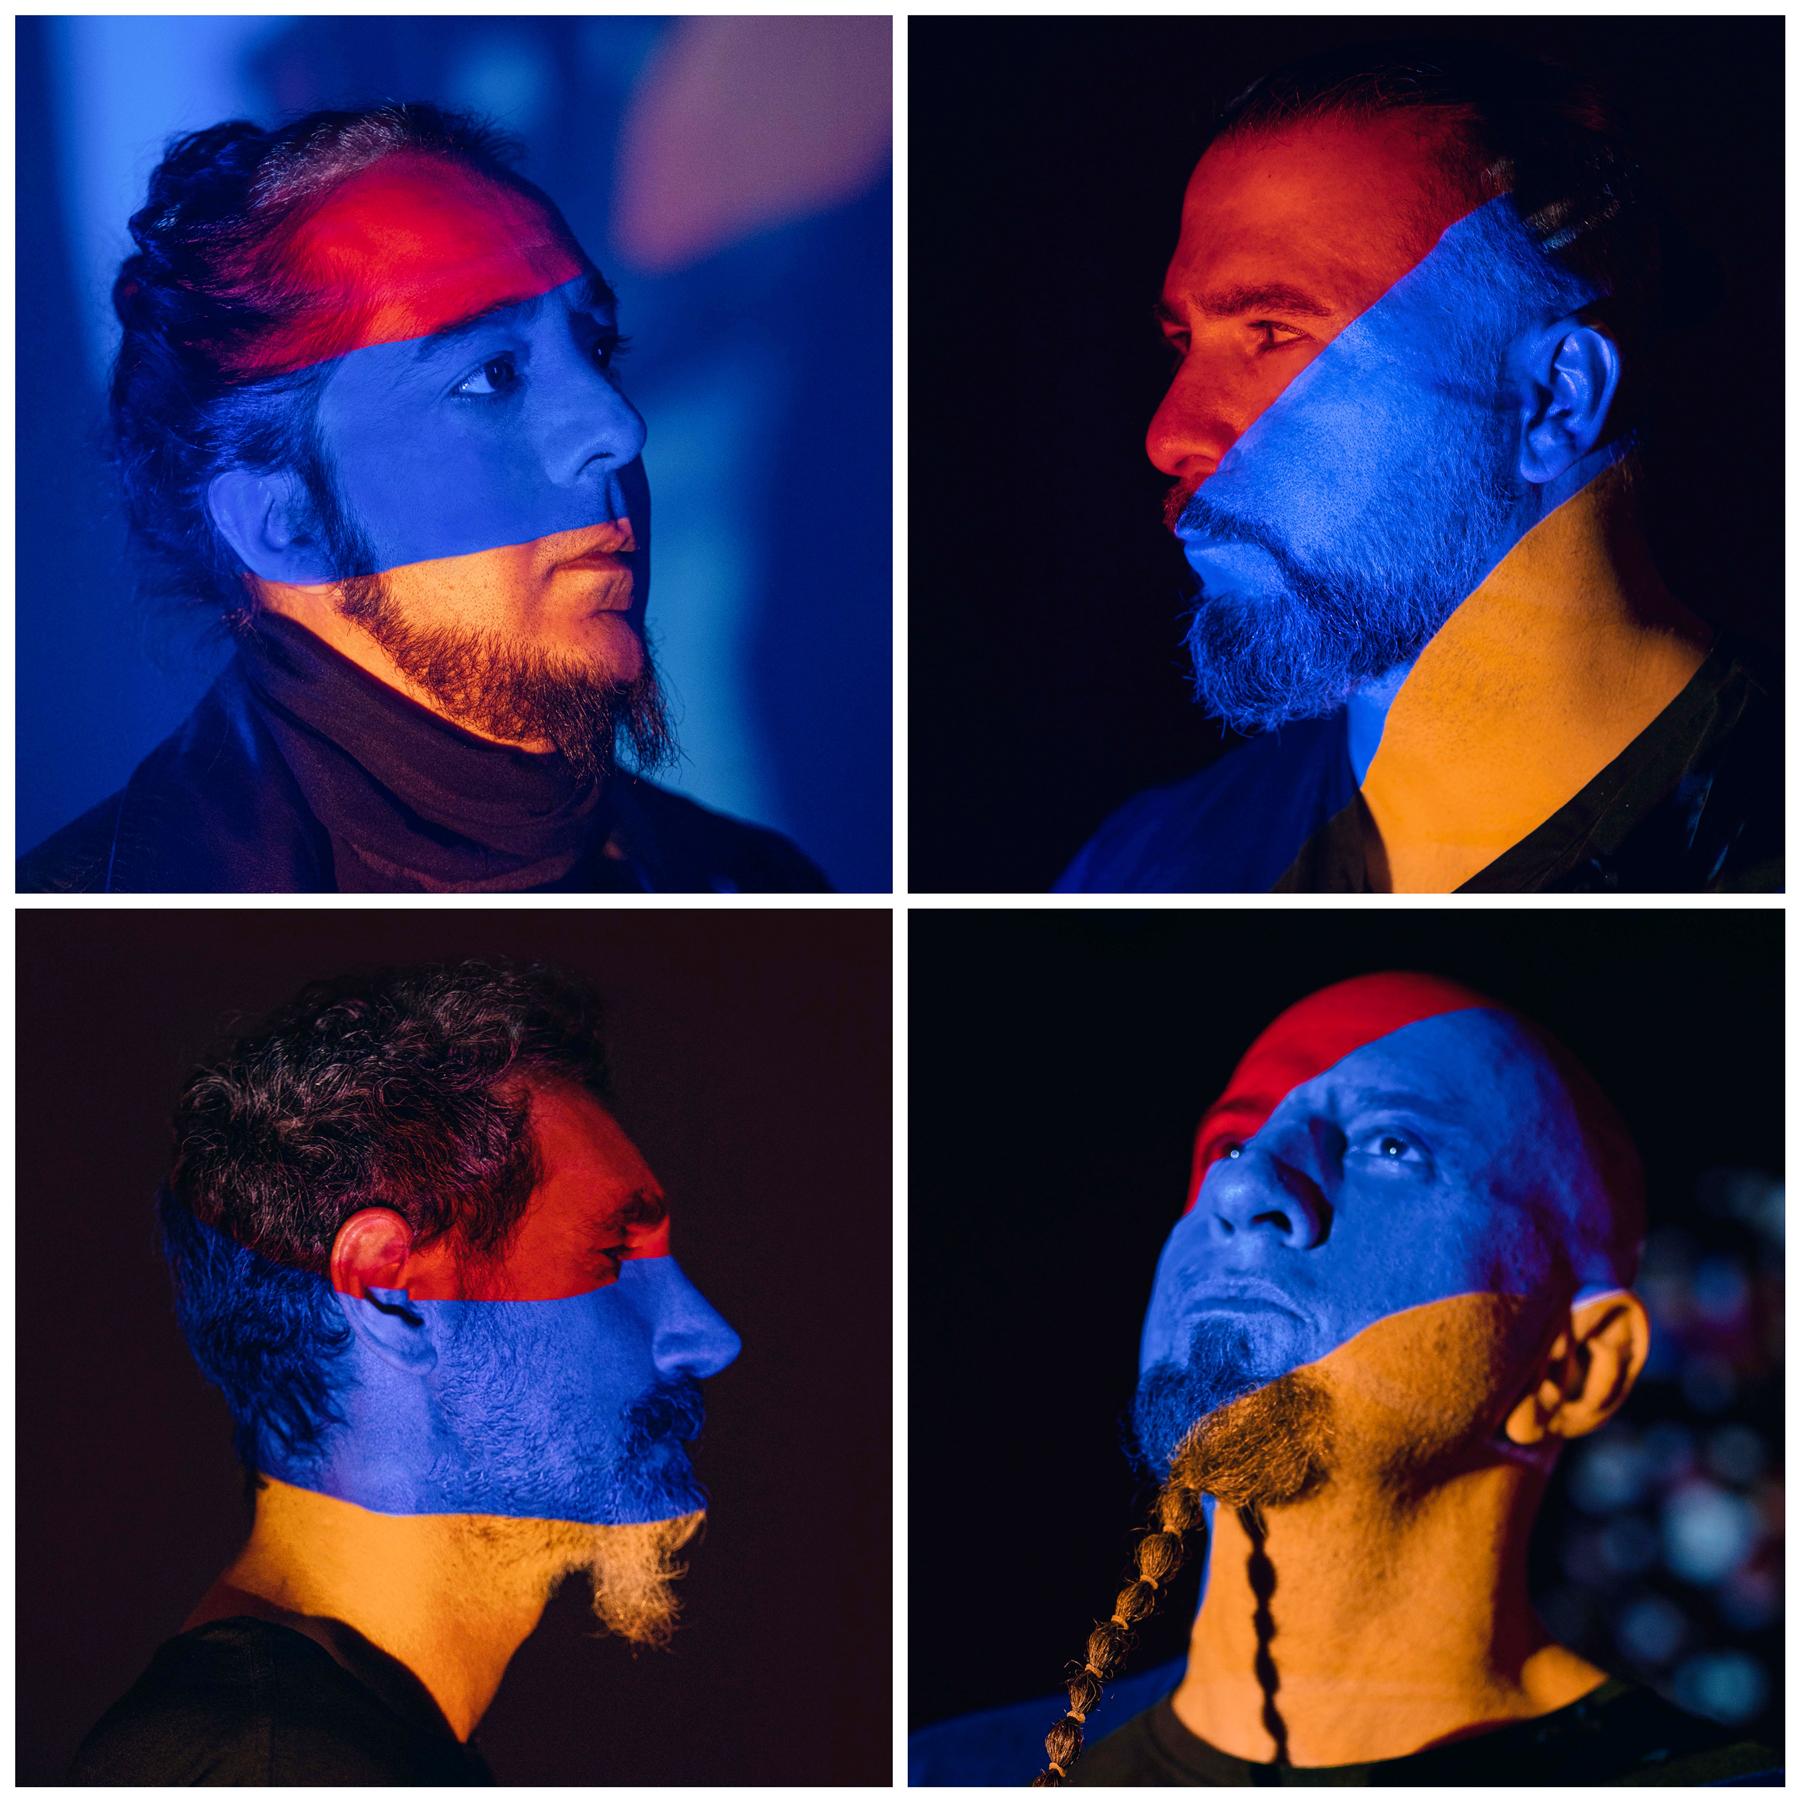 Top, from Left: Daron Malakian, John Dolmayan;Boffom, from Left: Serj Tankian, Shavo Odadjian